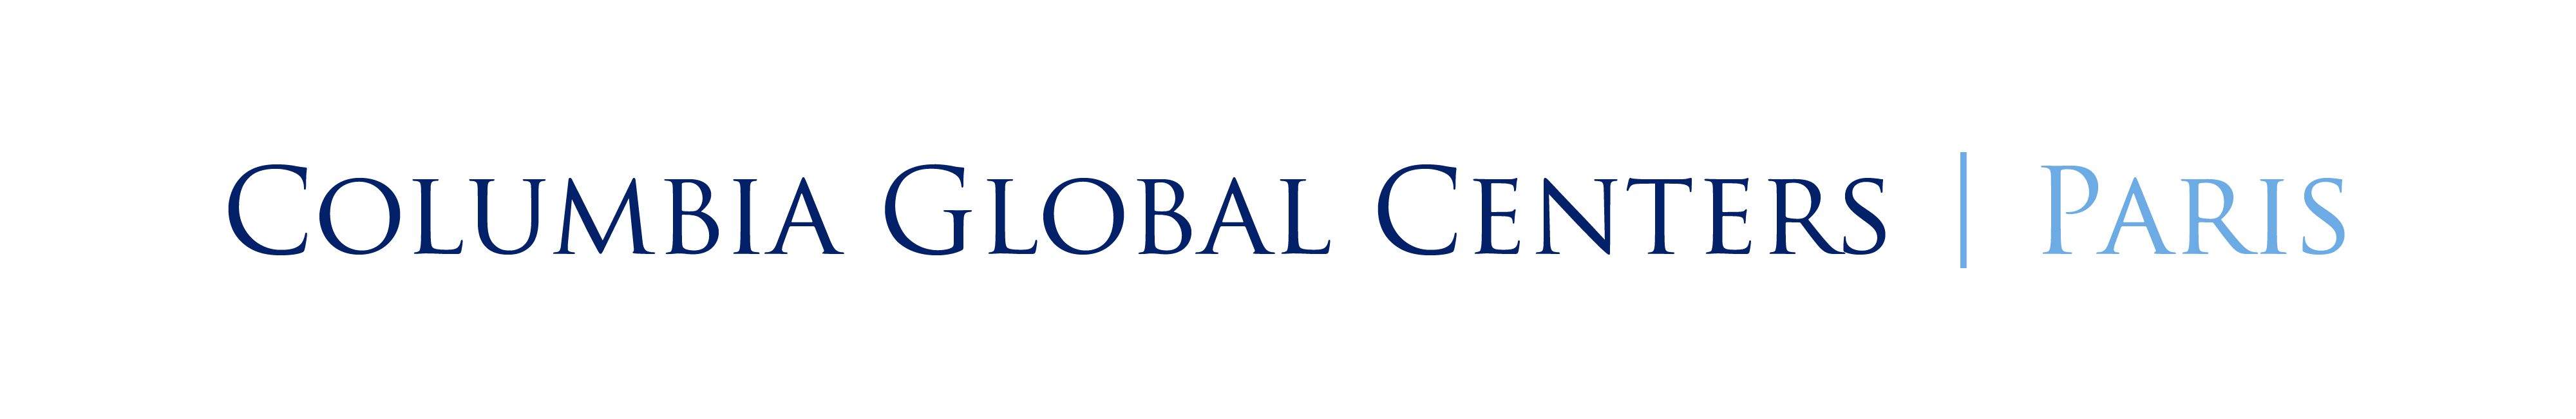 Header_CHC_Paris_HD_Logo_-_Paris_-_transparent_(7)_(2).png